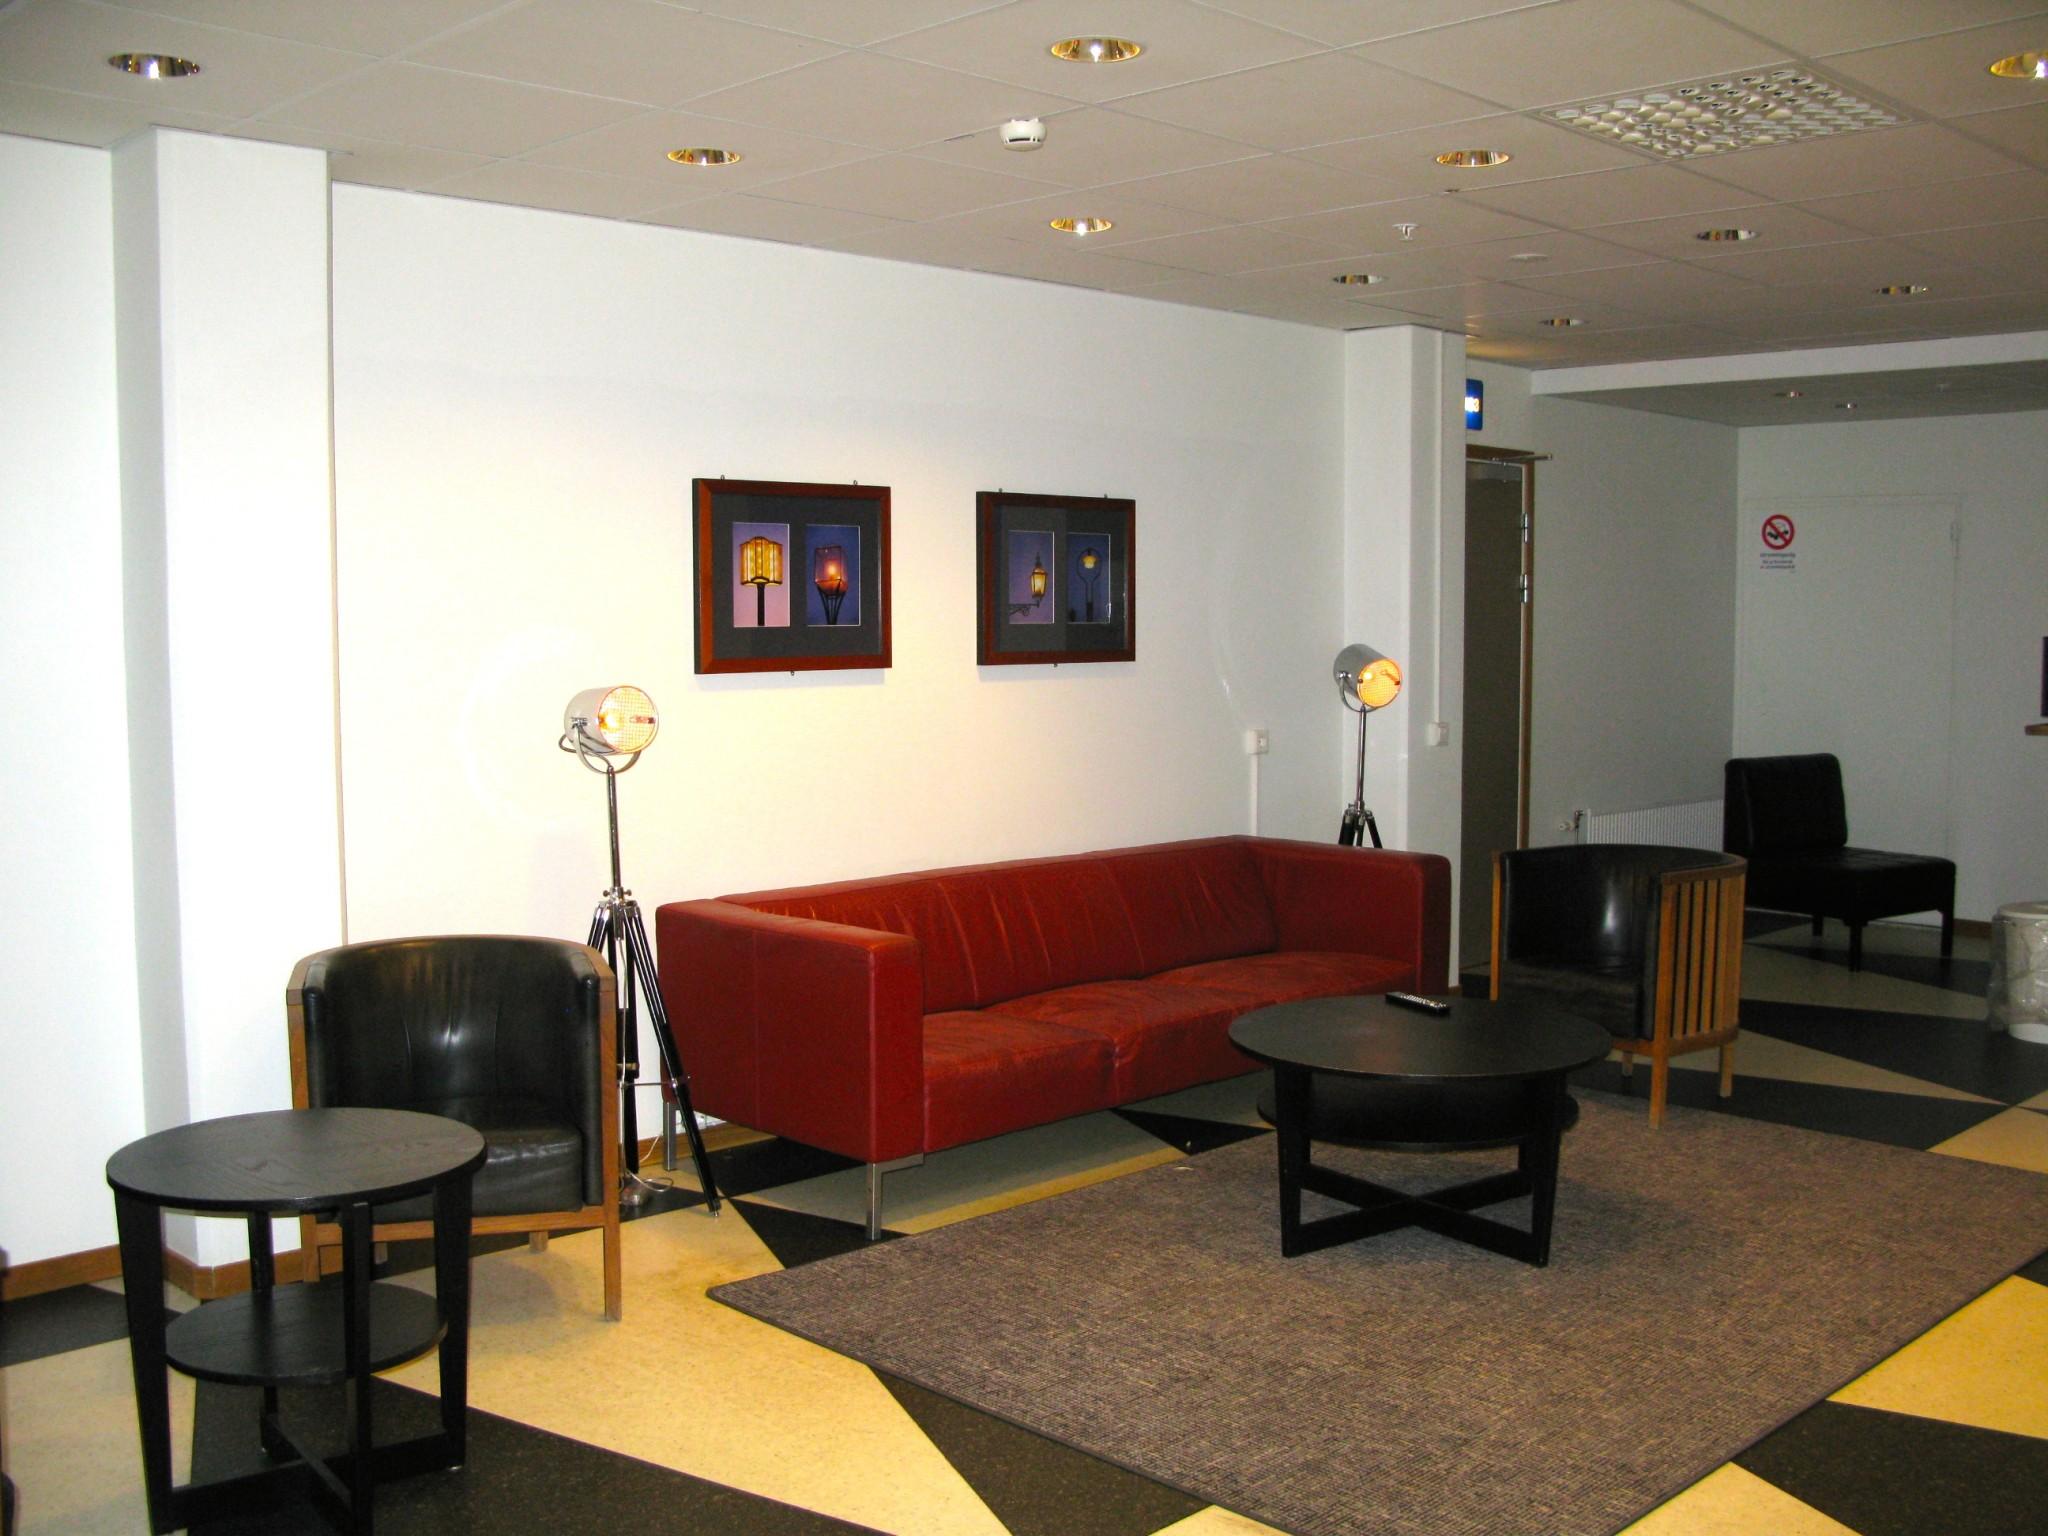 Hotel Micro Tukholma